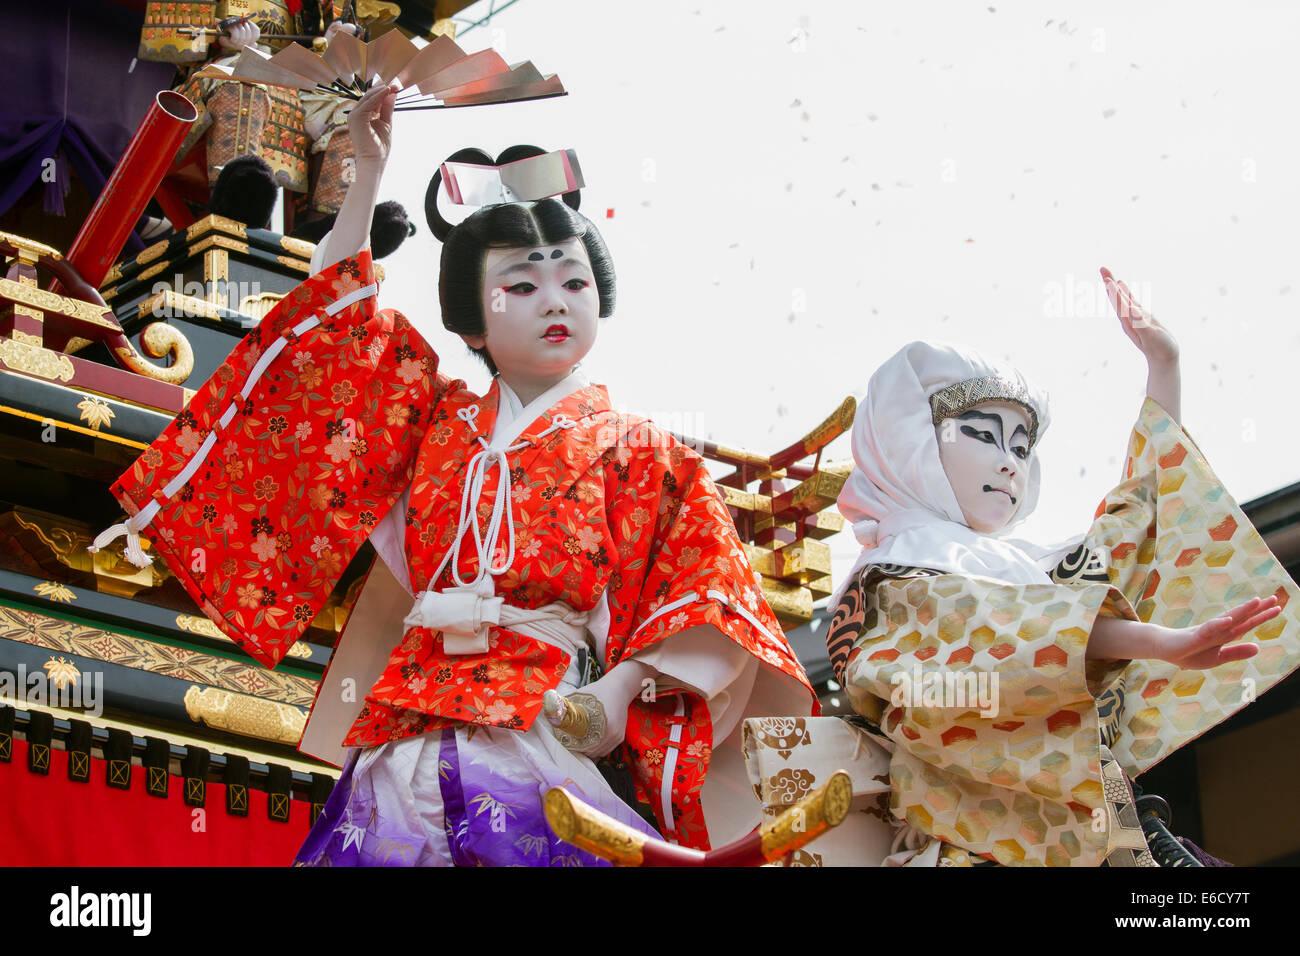 Children in costume in a Kabuki performance on a yatai (festival float) at Furukawa Festival, Hida-Furukawa, Japan. - Stock Image